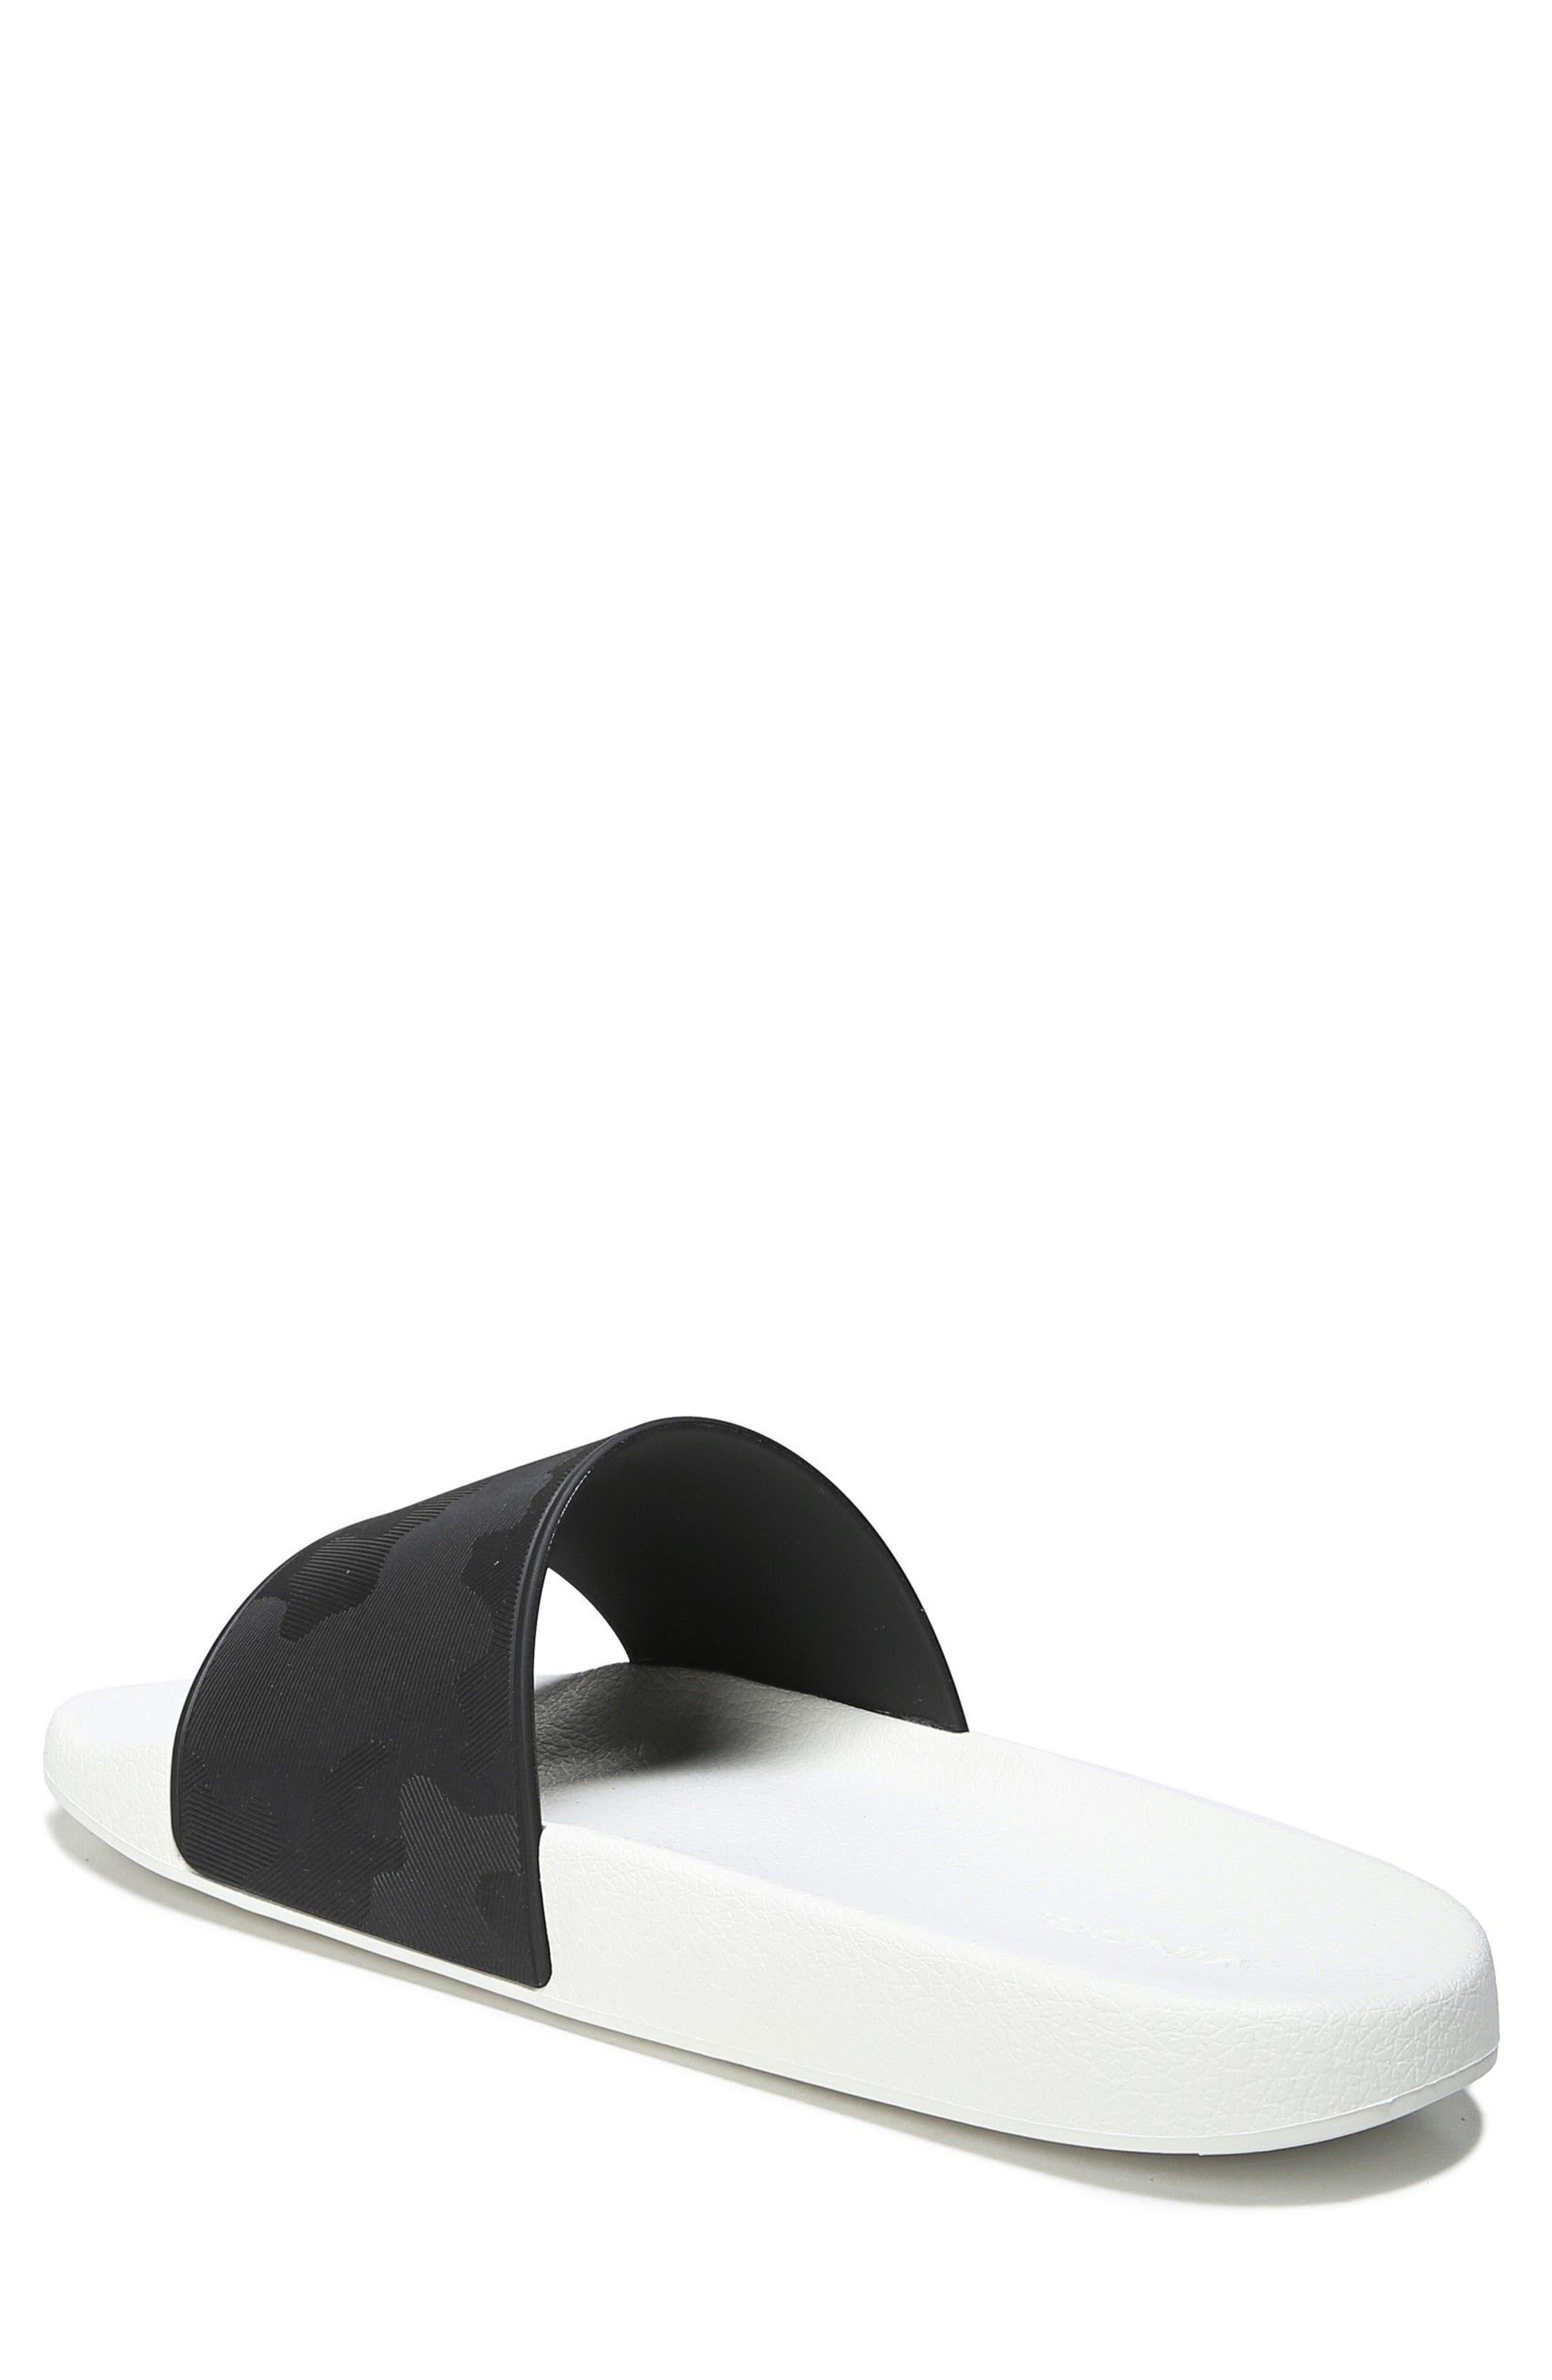 Westcoast-2 Slide Sandal,                             Alternate thumbnail 2, color,                             001